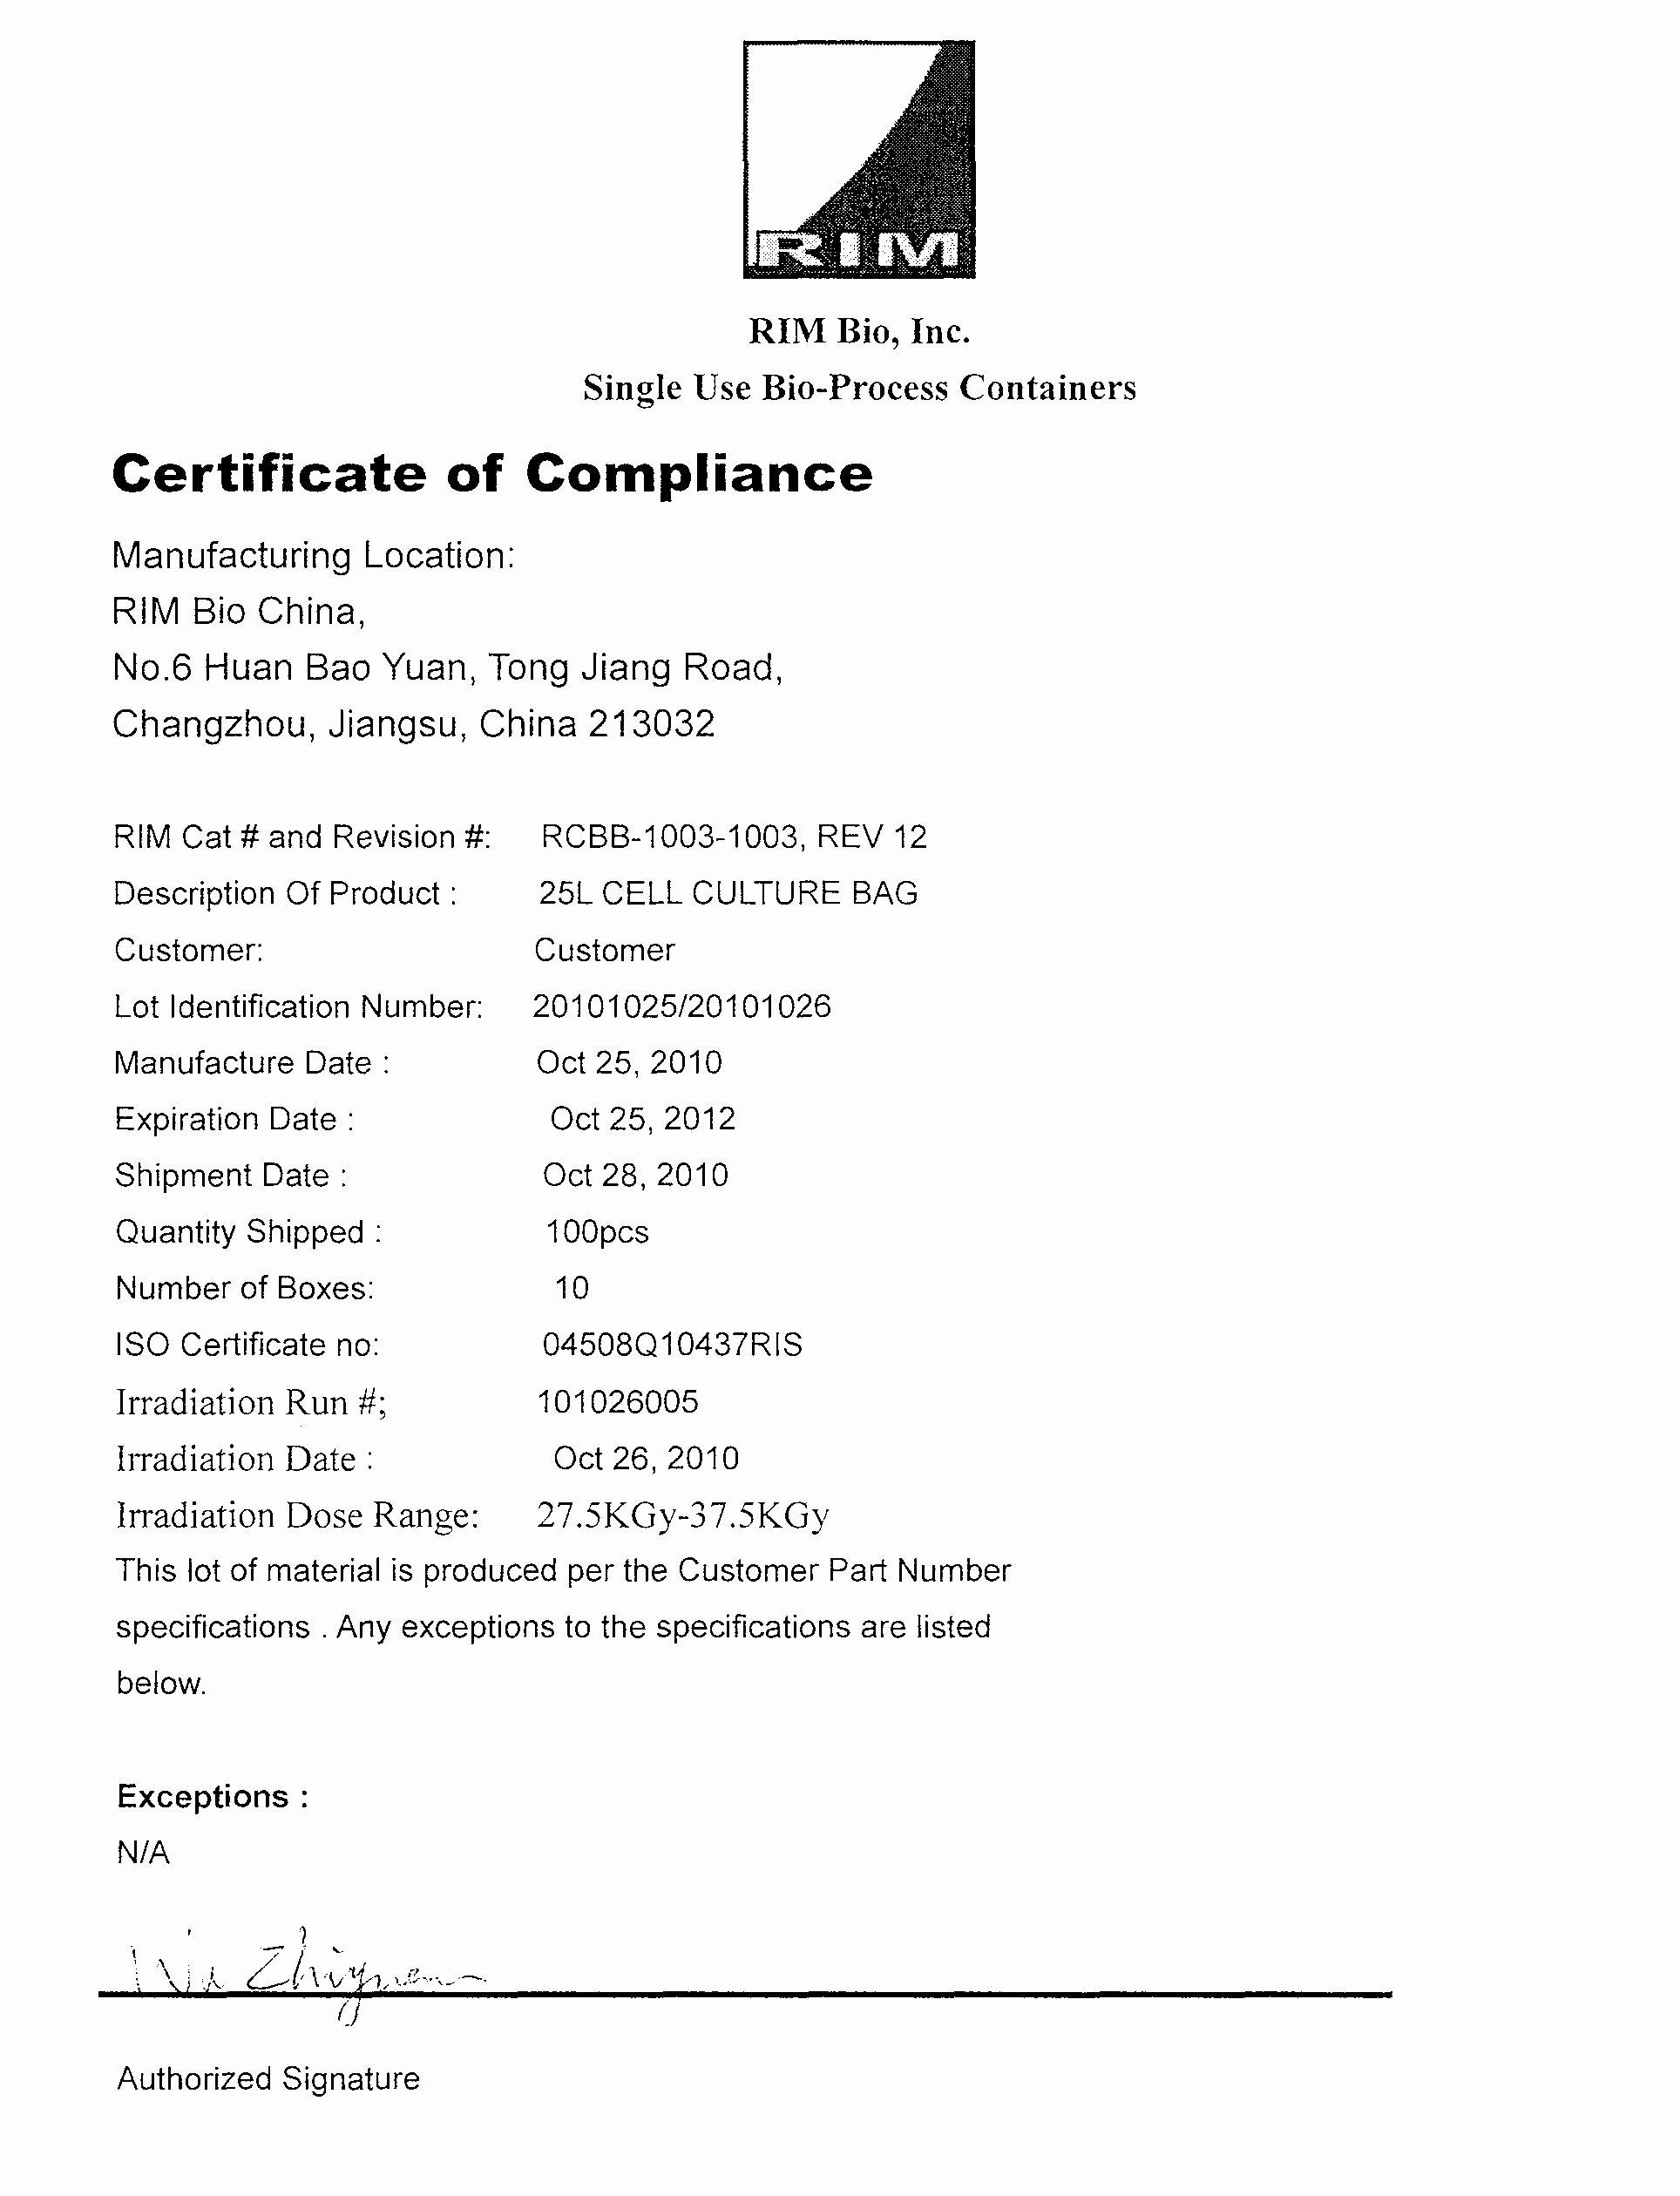 Reach Certificate Of Compliance Template Luxury Certificate Of Pliance & Lot Traceability